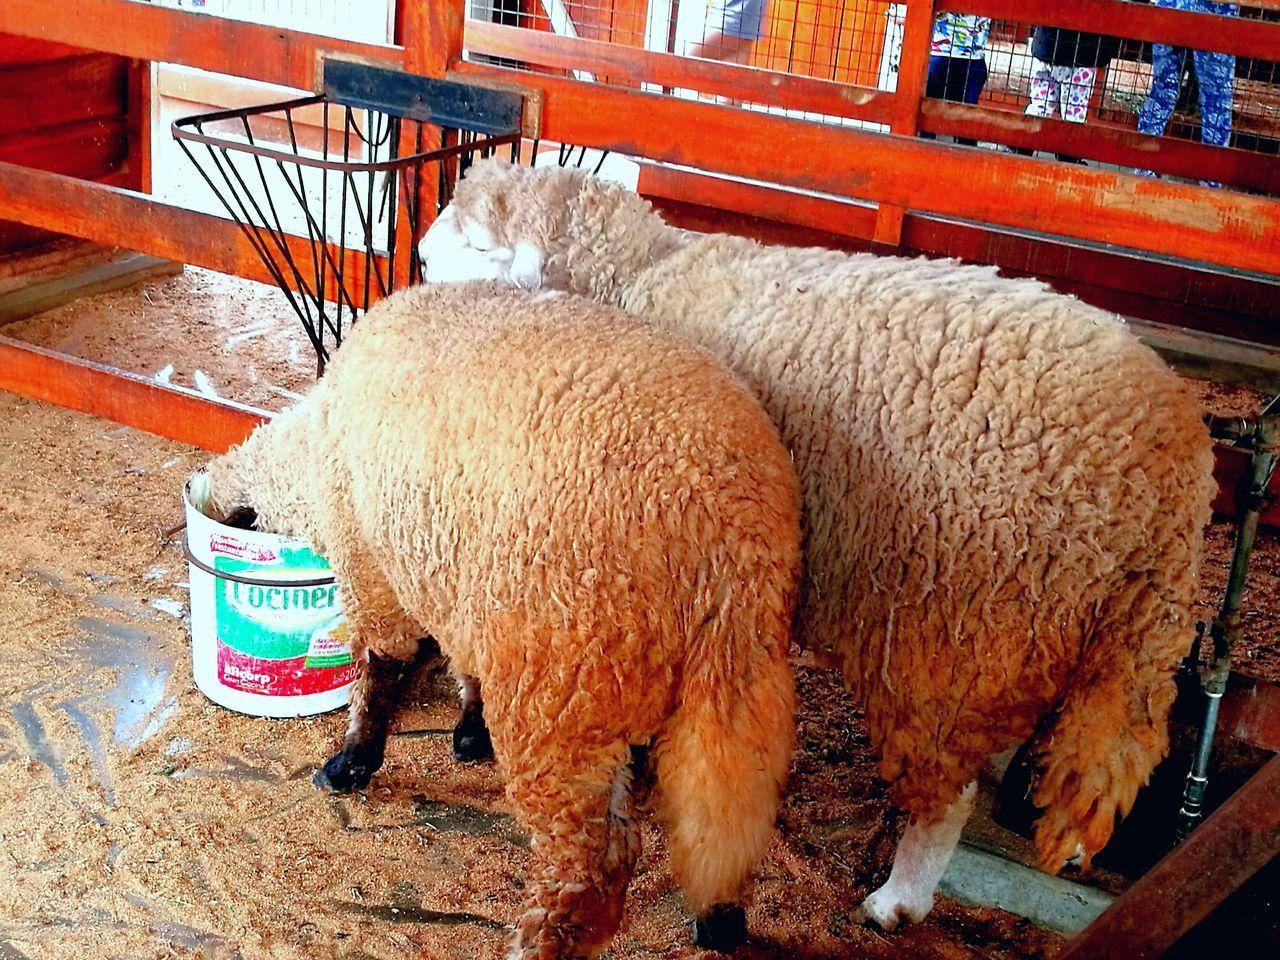 animal themes, mammal, livestock, domestic animals, no people, day, outdoors